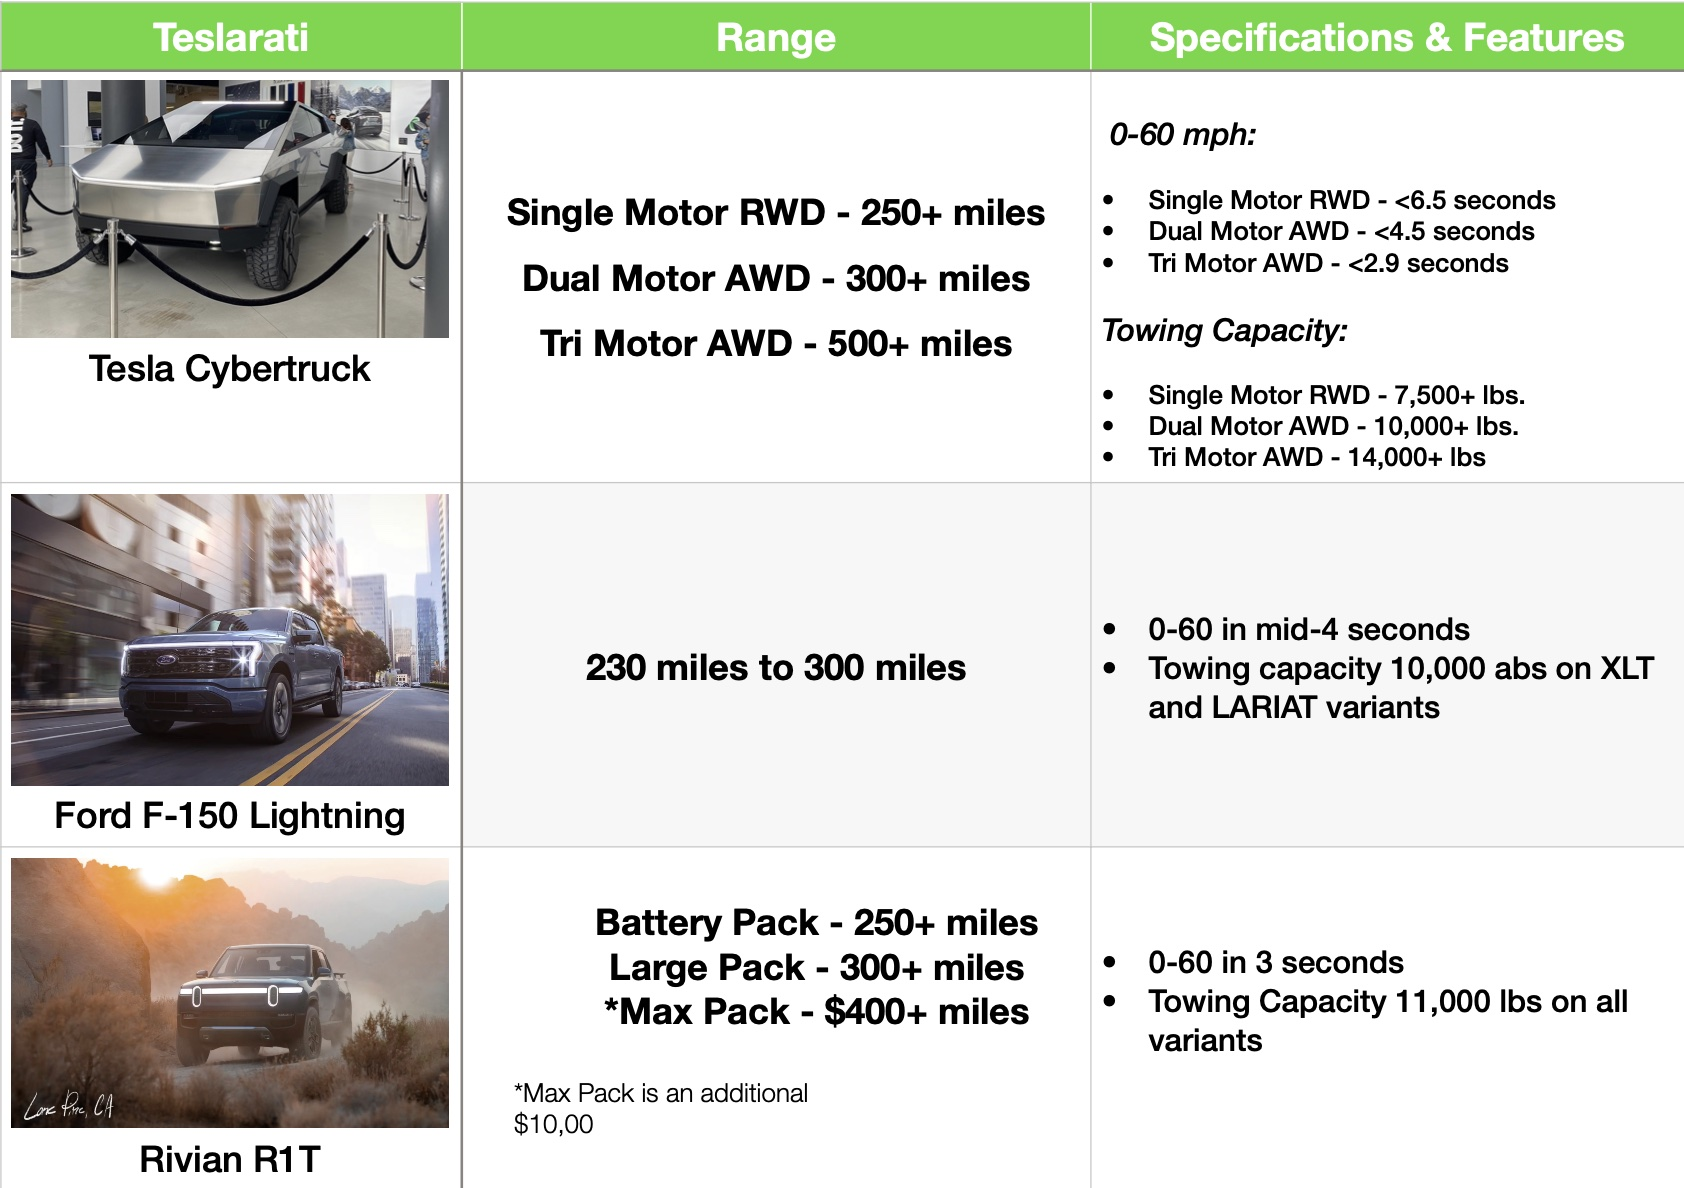 Ford-F-150-Lightning-Tesla-Cybertruck-Rivian-R1T